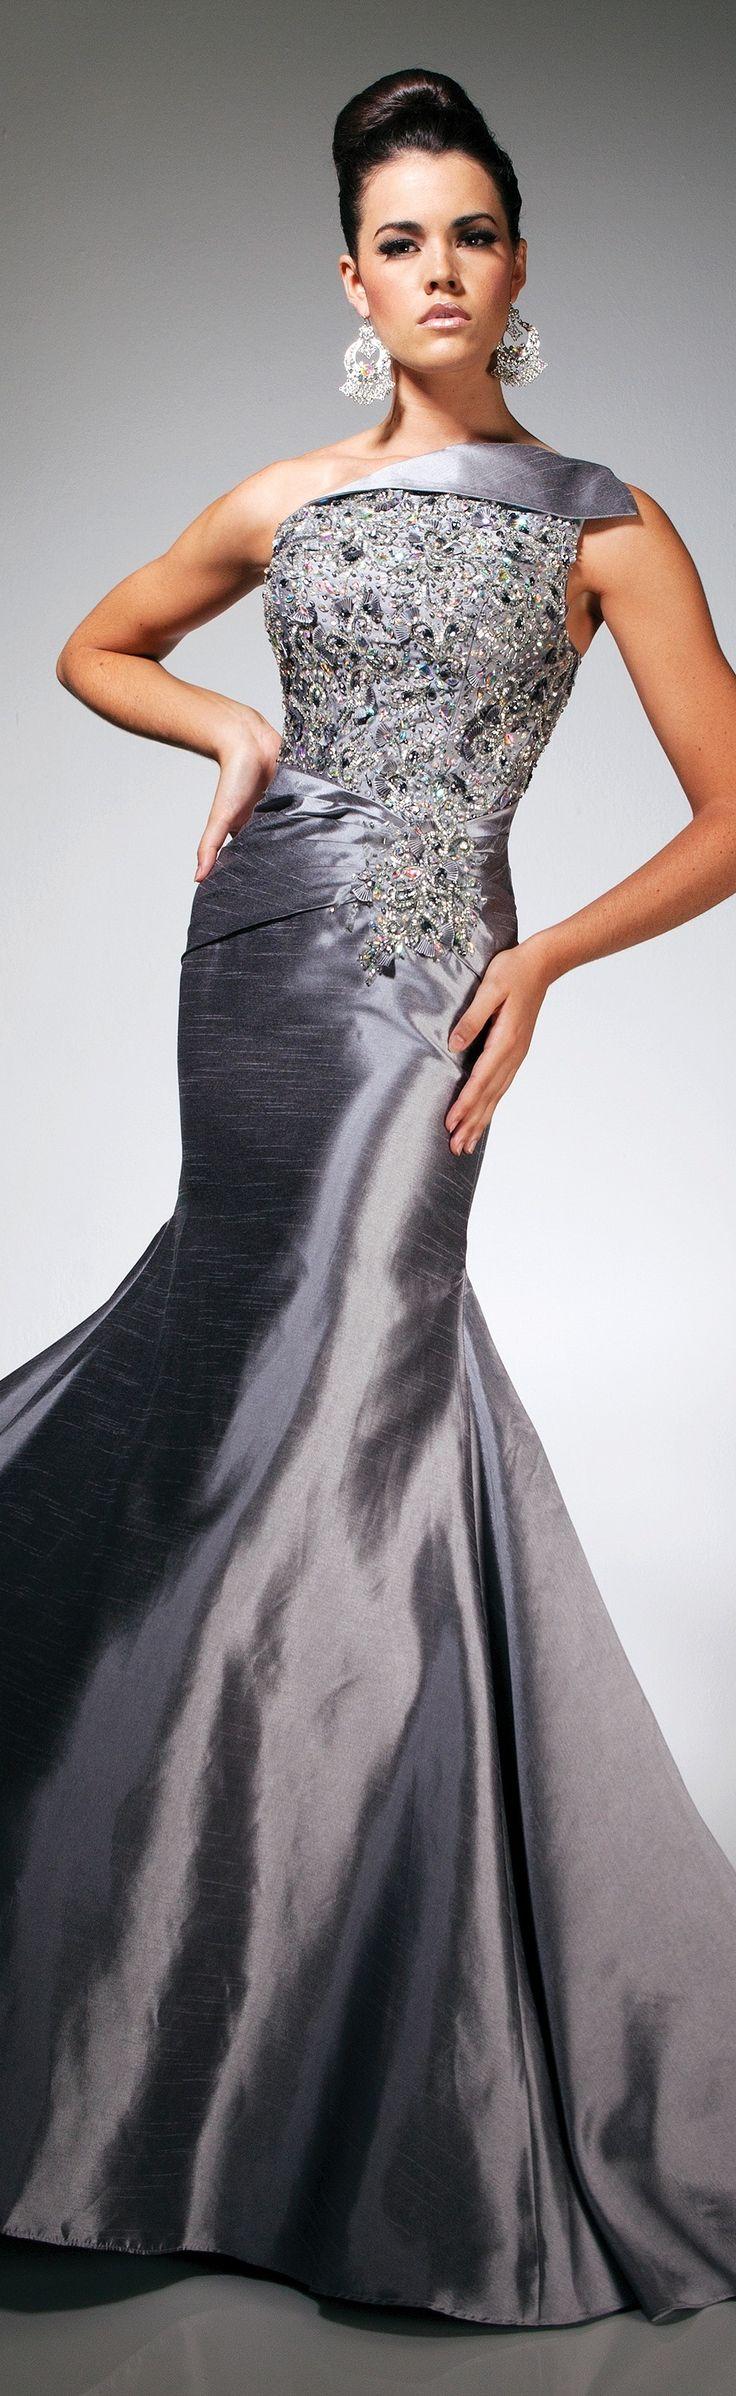 Anthony Richards Evening Dresses with Jackets | Dress images